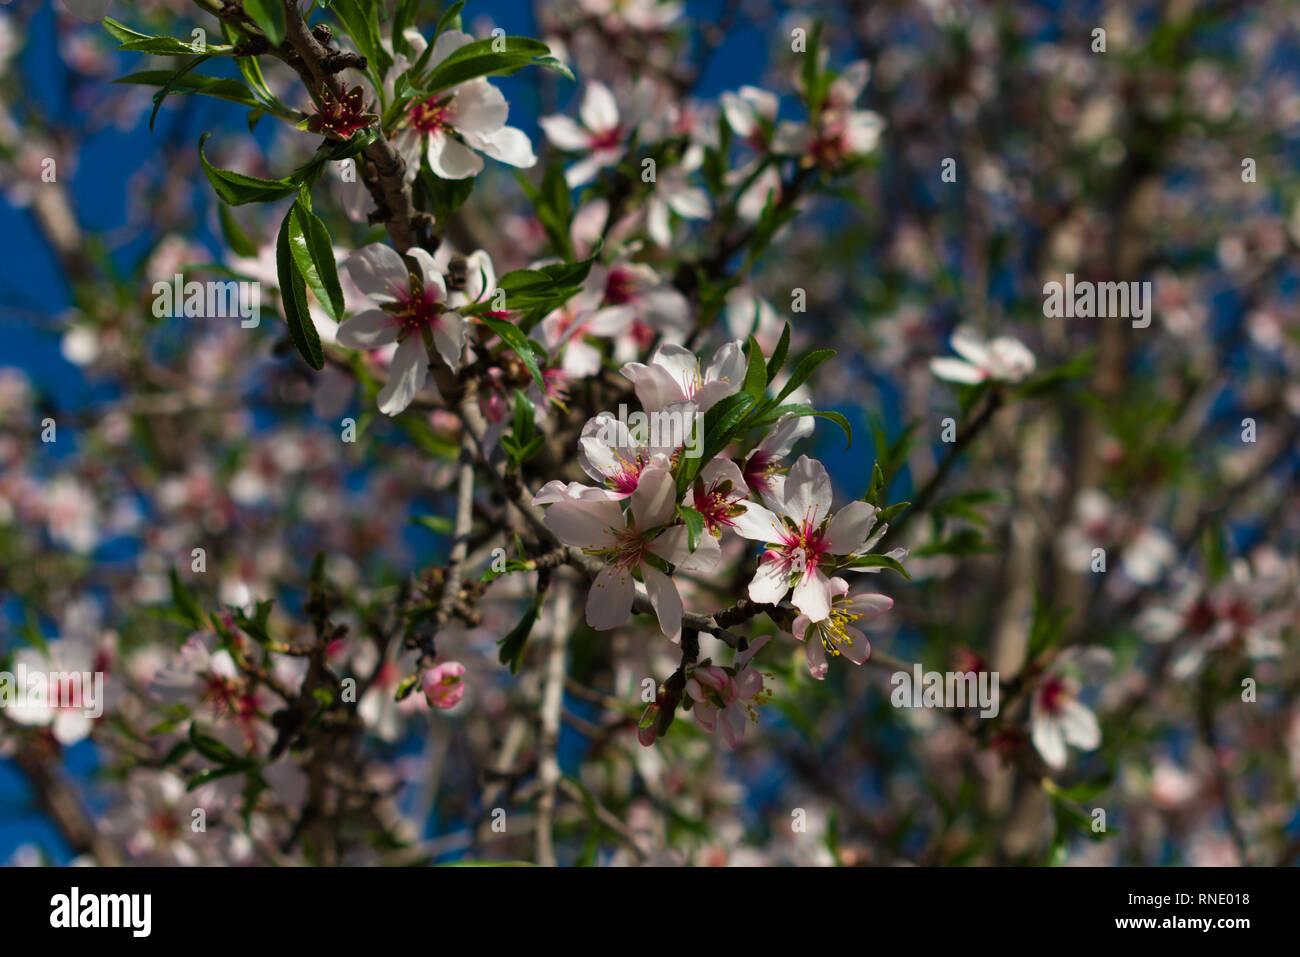 Almond flower - Stock Image